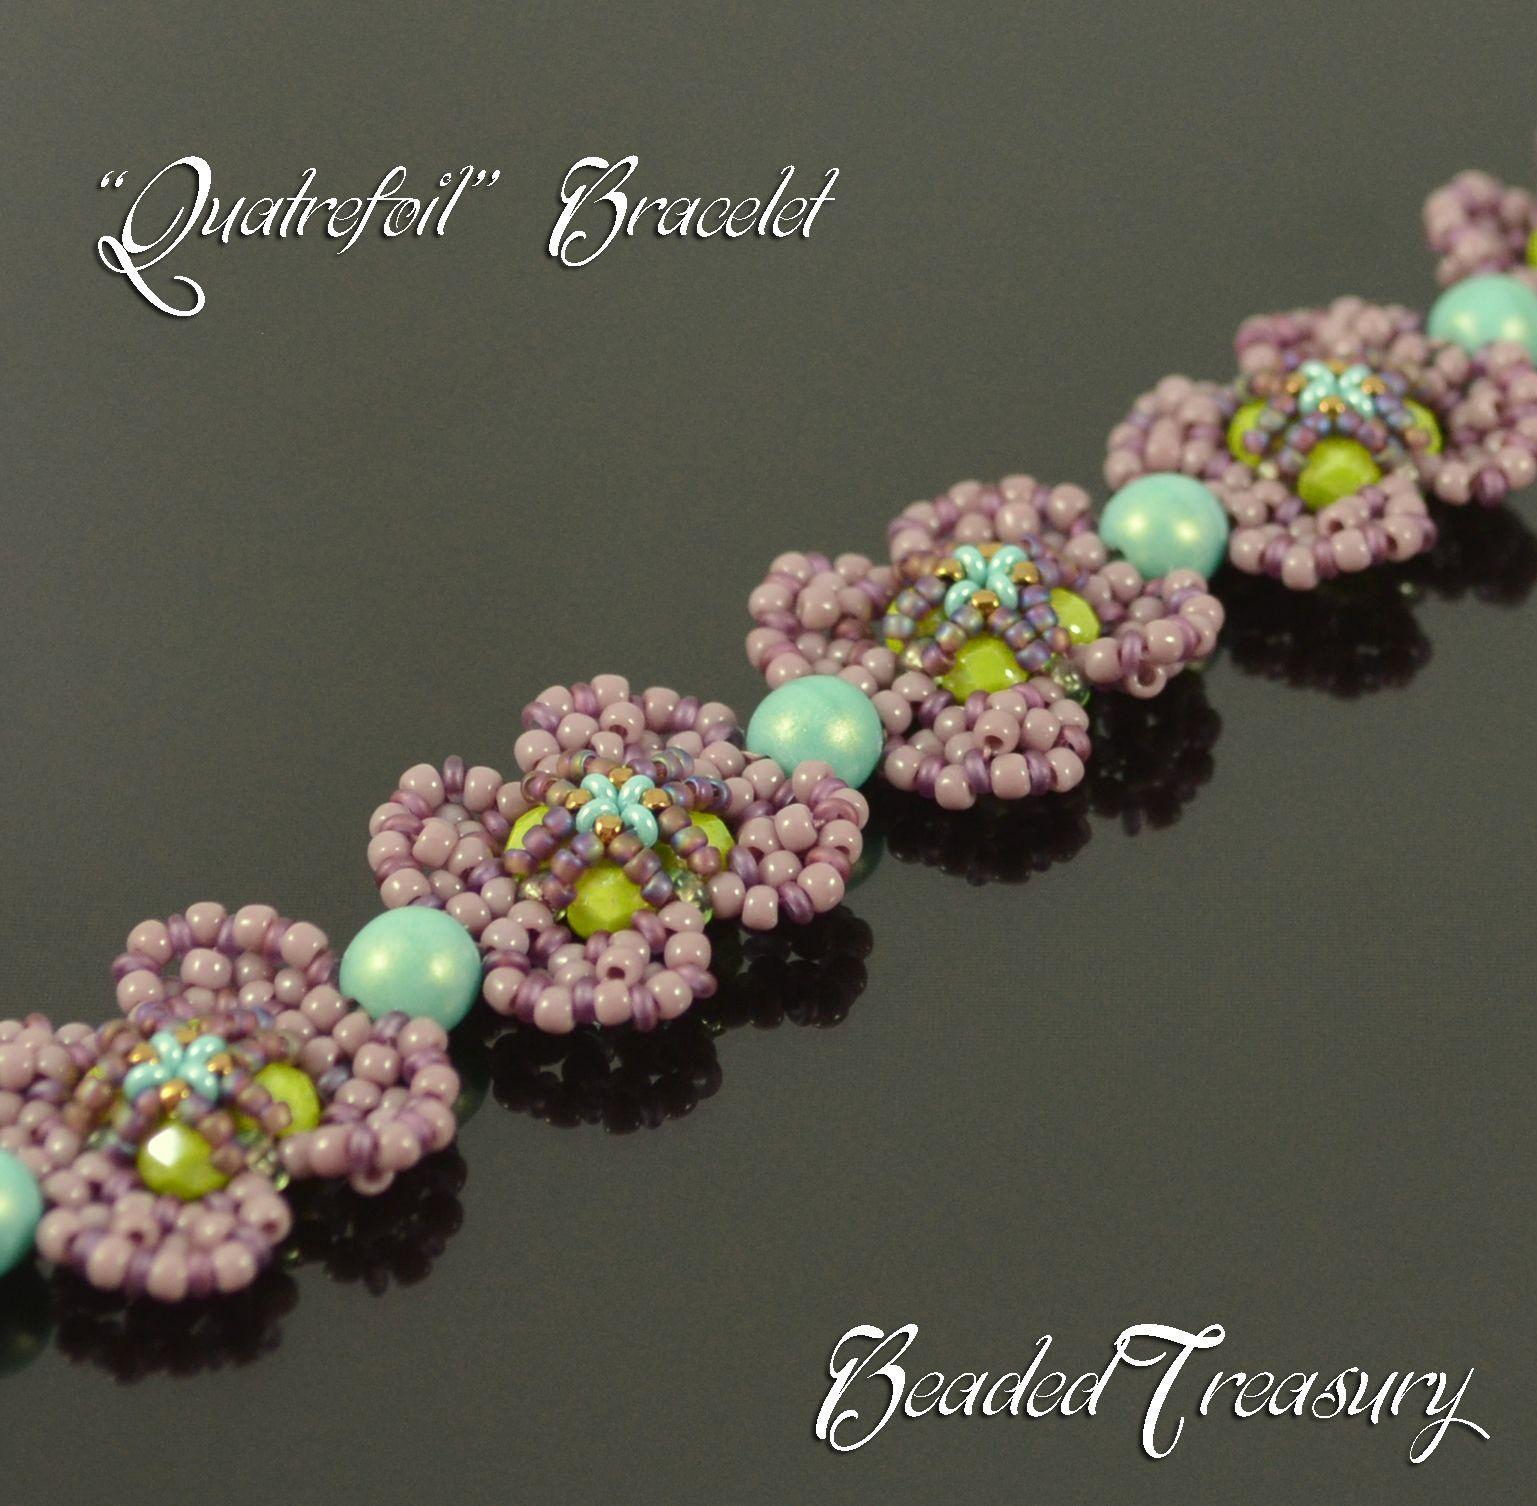 Heart Bead Green 18mm Green Silver Foil Heart Bead DIY Jewelry Craft 7 pcs